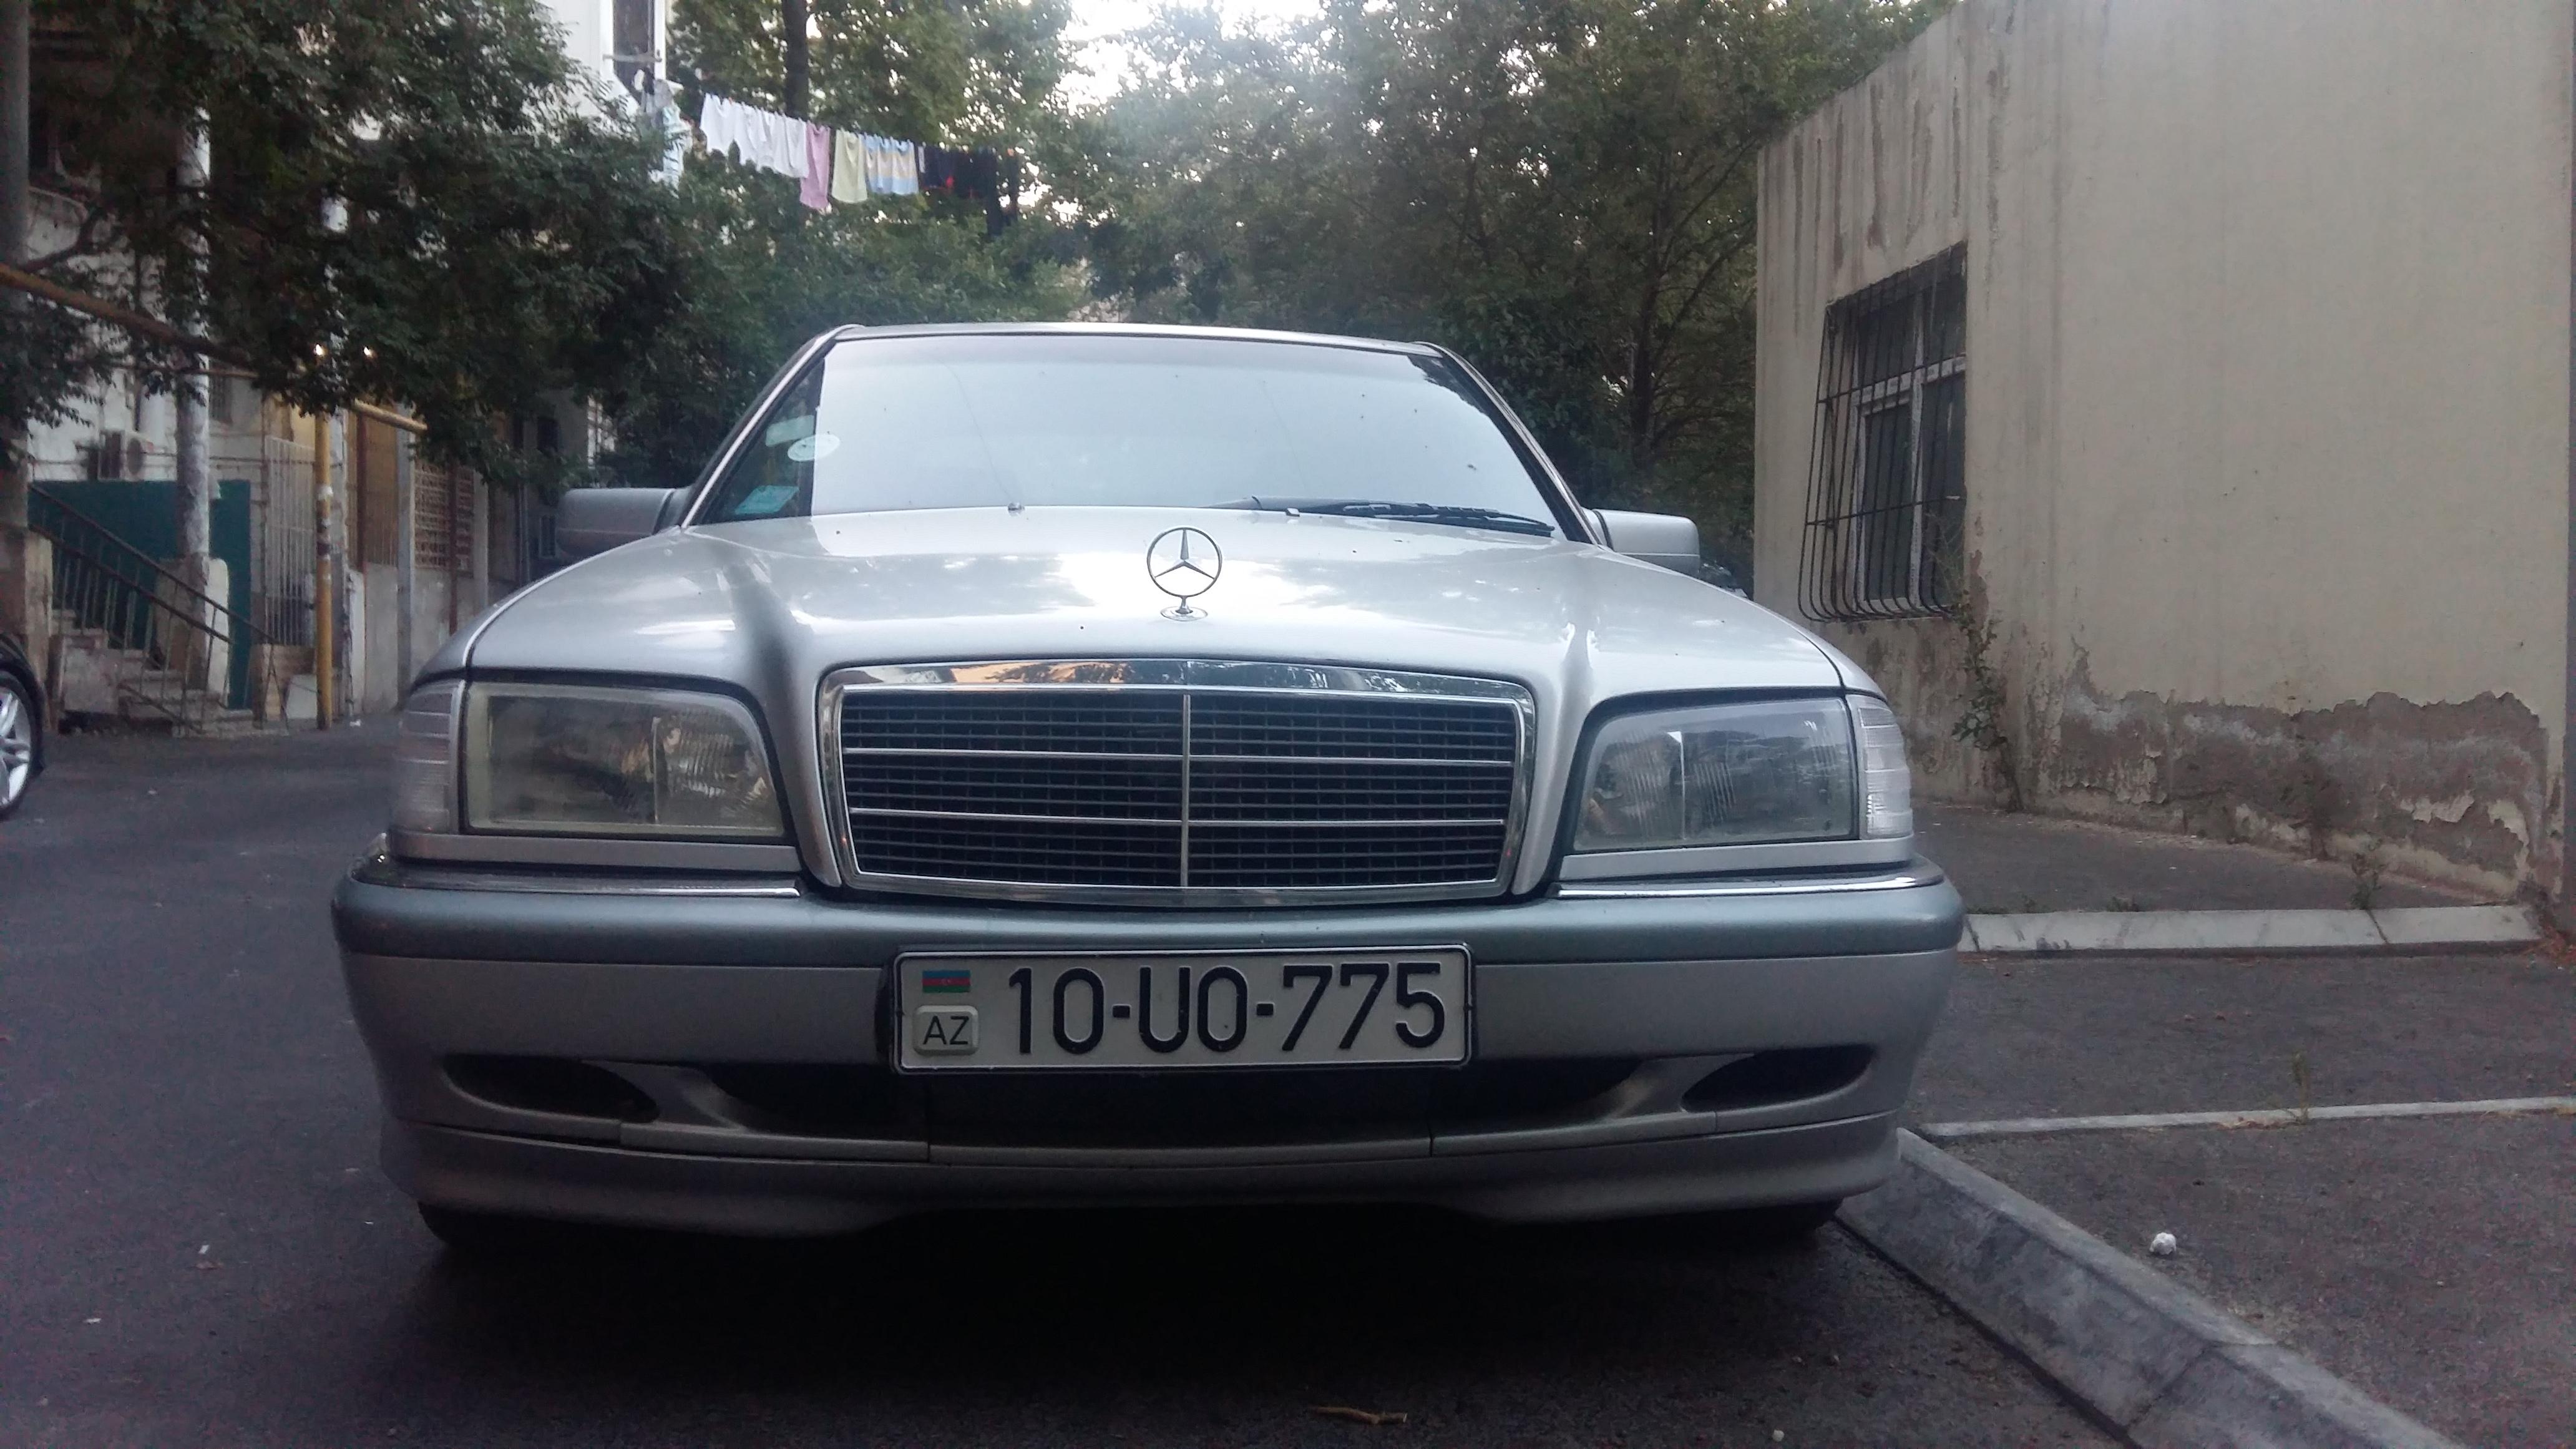 Mercedes-Benz C 230 2.3(lt) 1997 İkinci əl  $10000